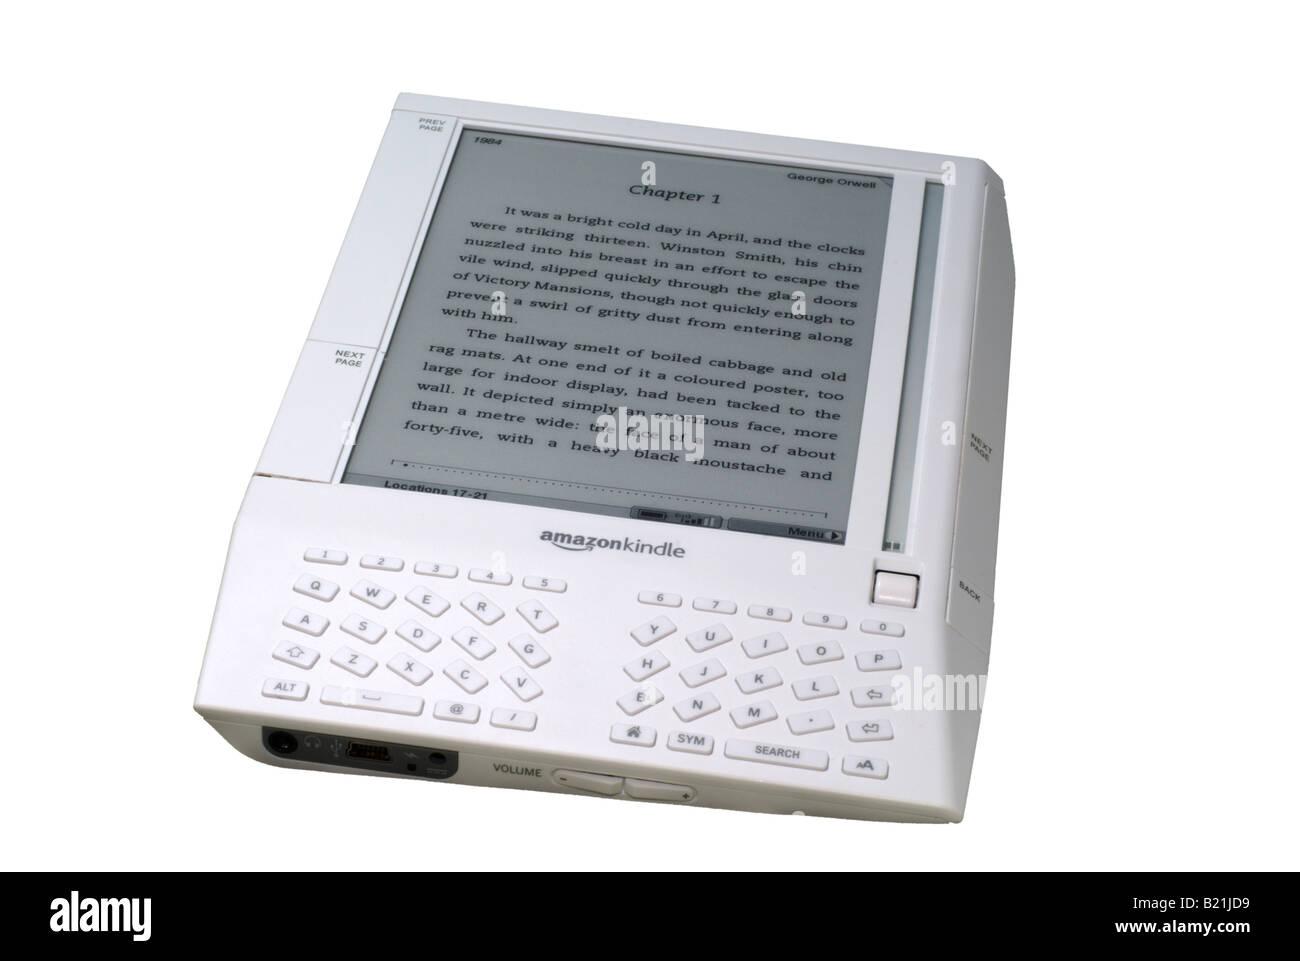 Ebook Reader Stock Photos & Ebook Reader Stock Images - Alamy